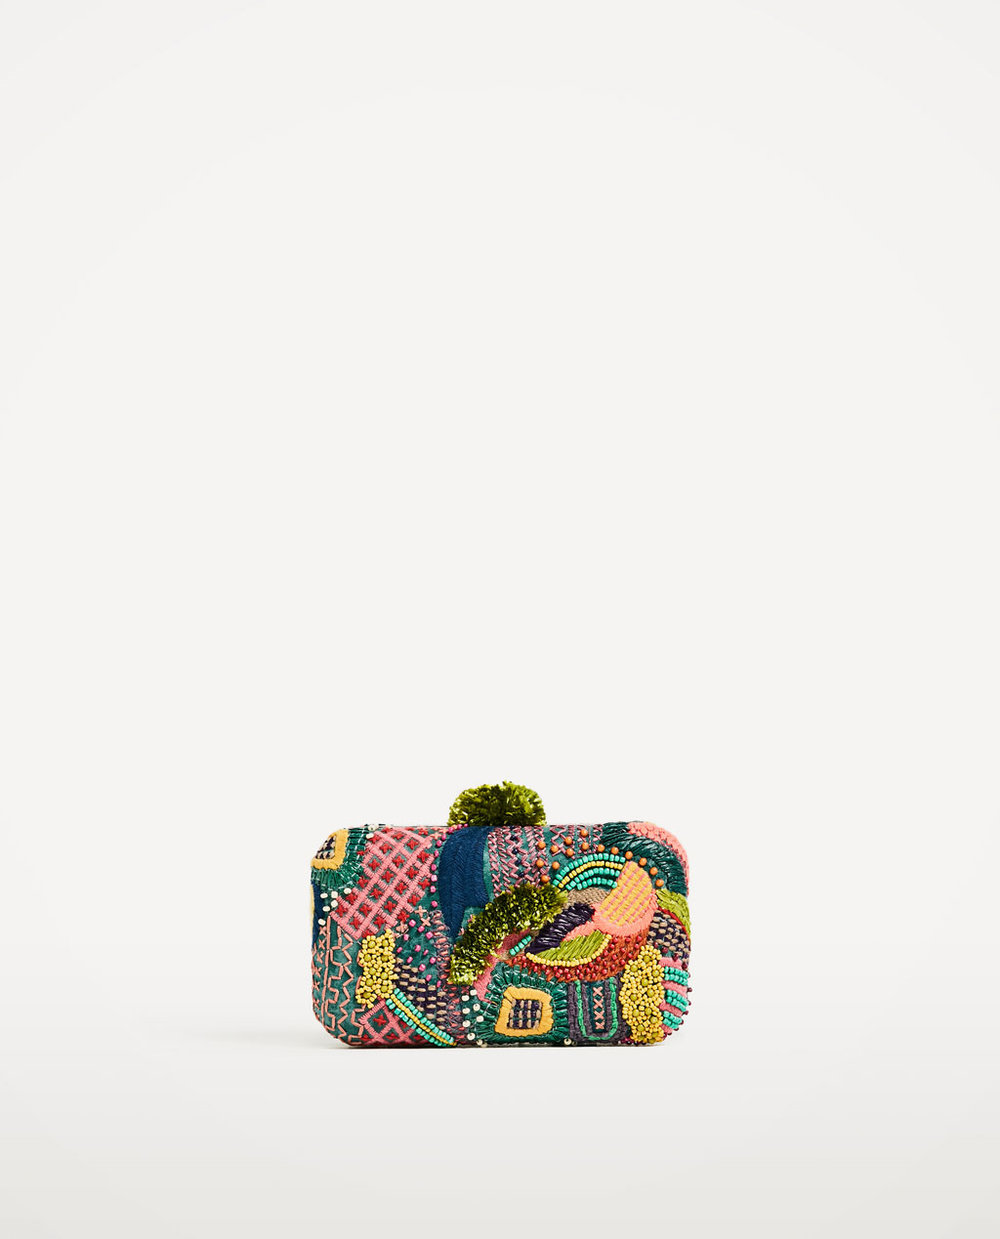 Zara Multi-Colored Fabric Minaudiere